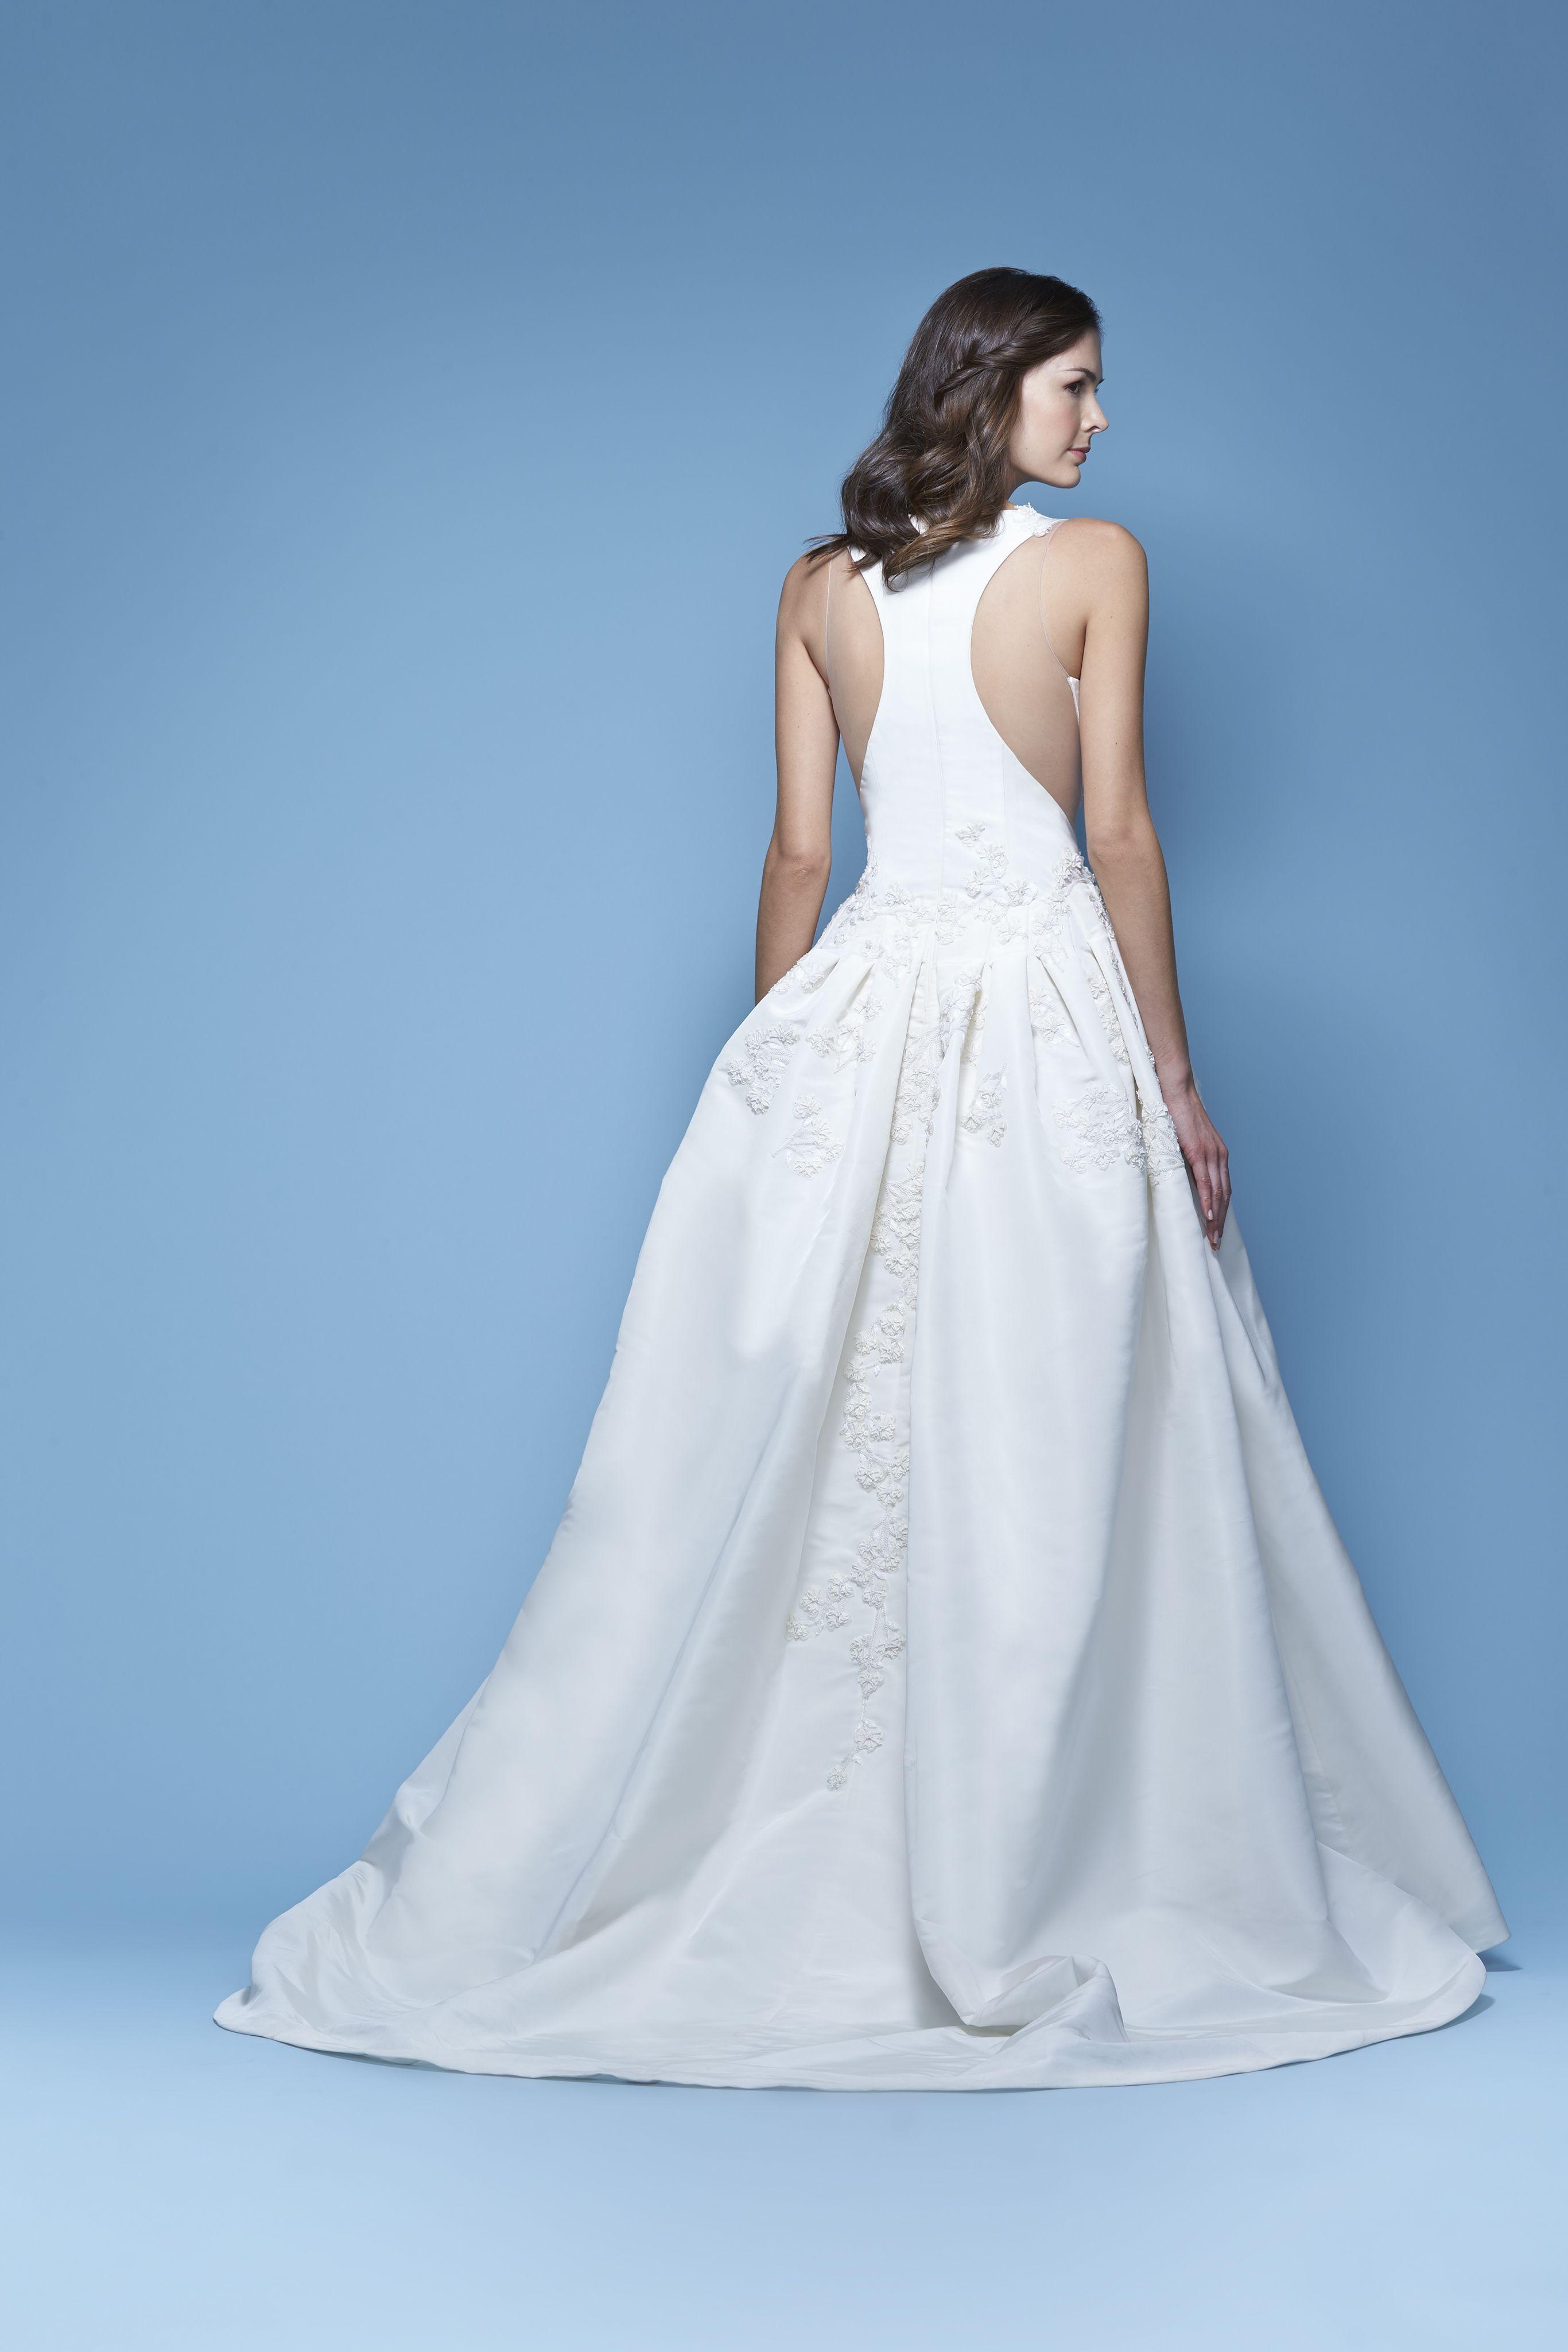 Carolina herrera bridal spring ujoelleu bridal gown the dress